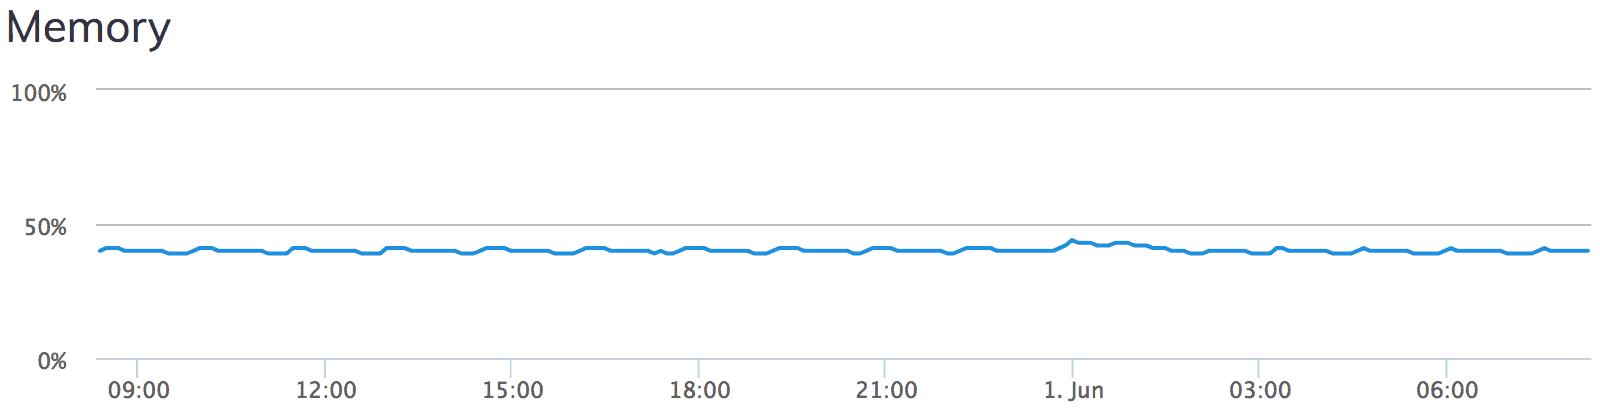 Serverpilot Server Memory Chart